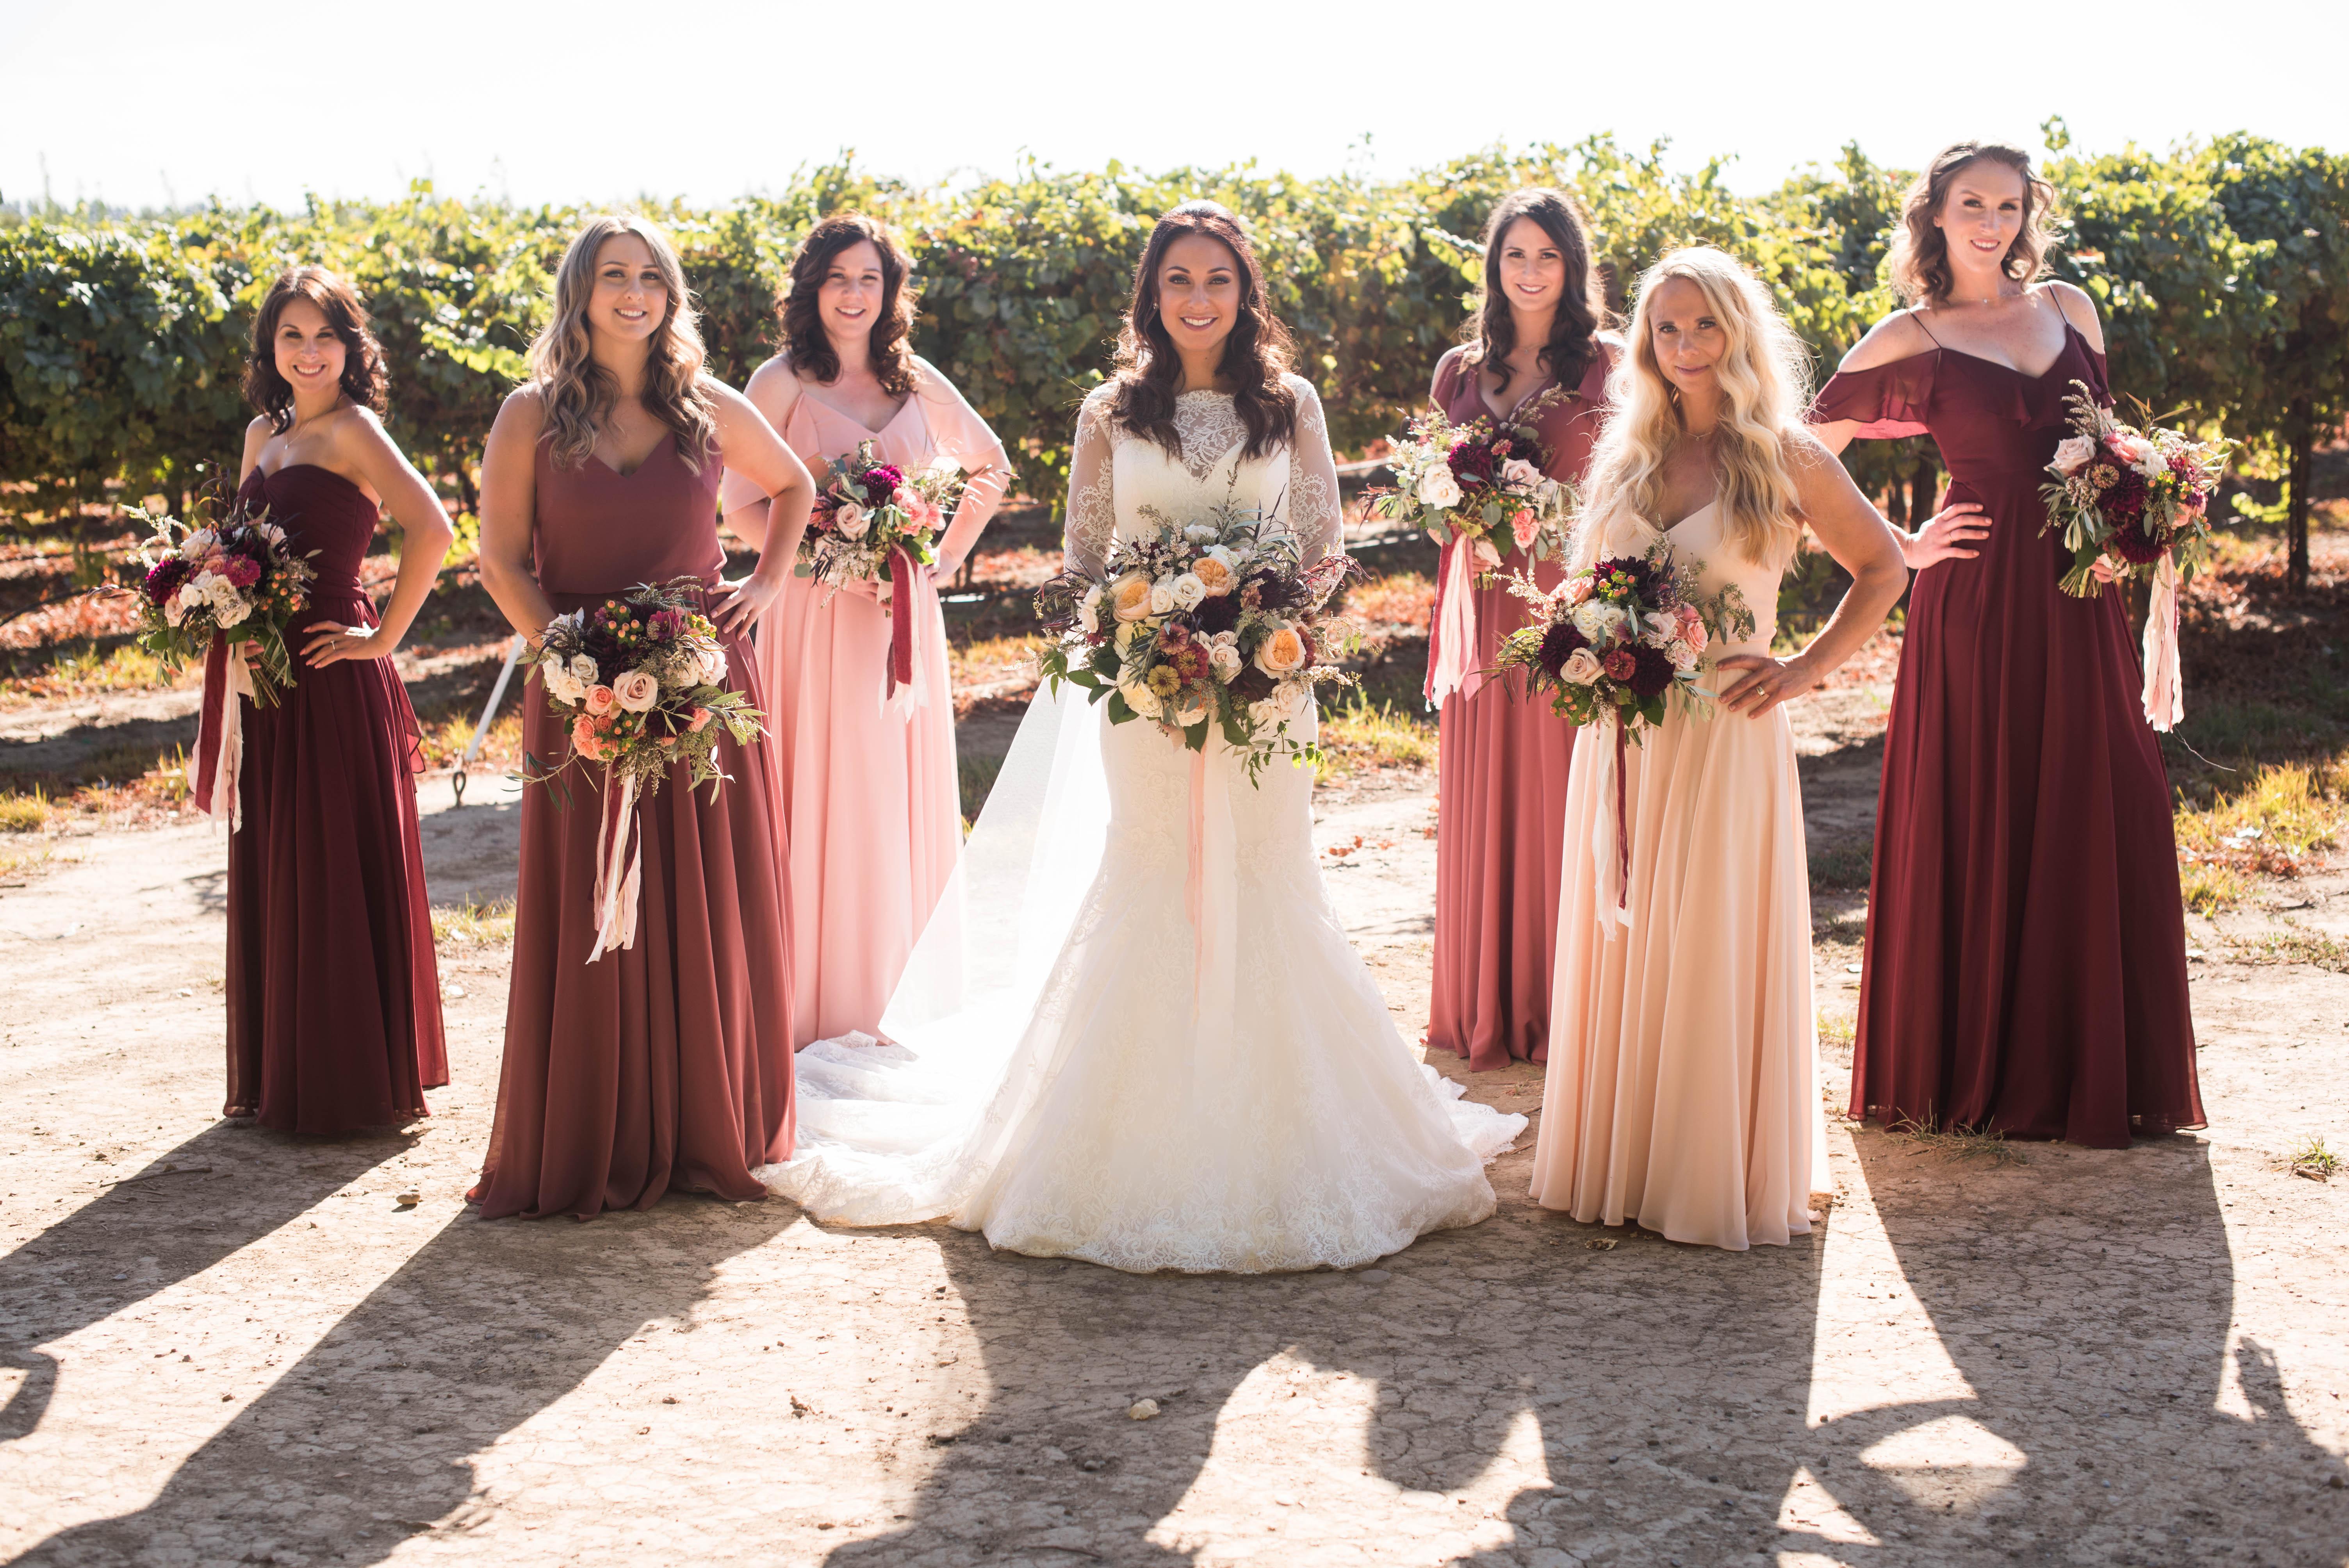 Liz + Ryan's Wedding at The Willow Ballroom + Event Center - The Willow Ballroom + Event Center